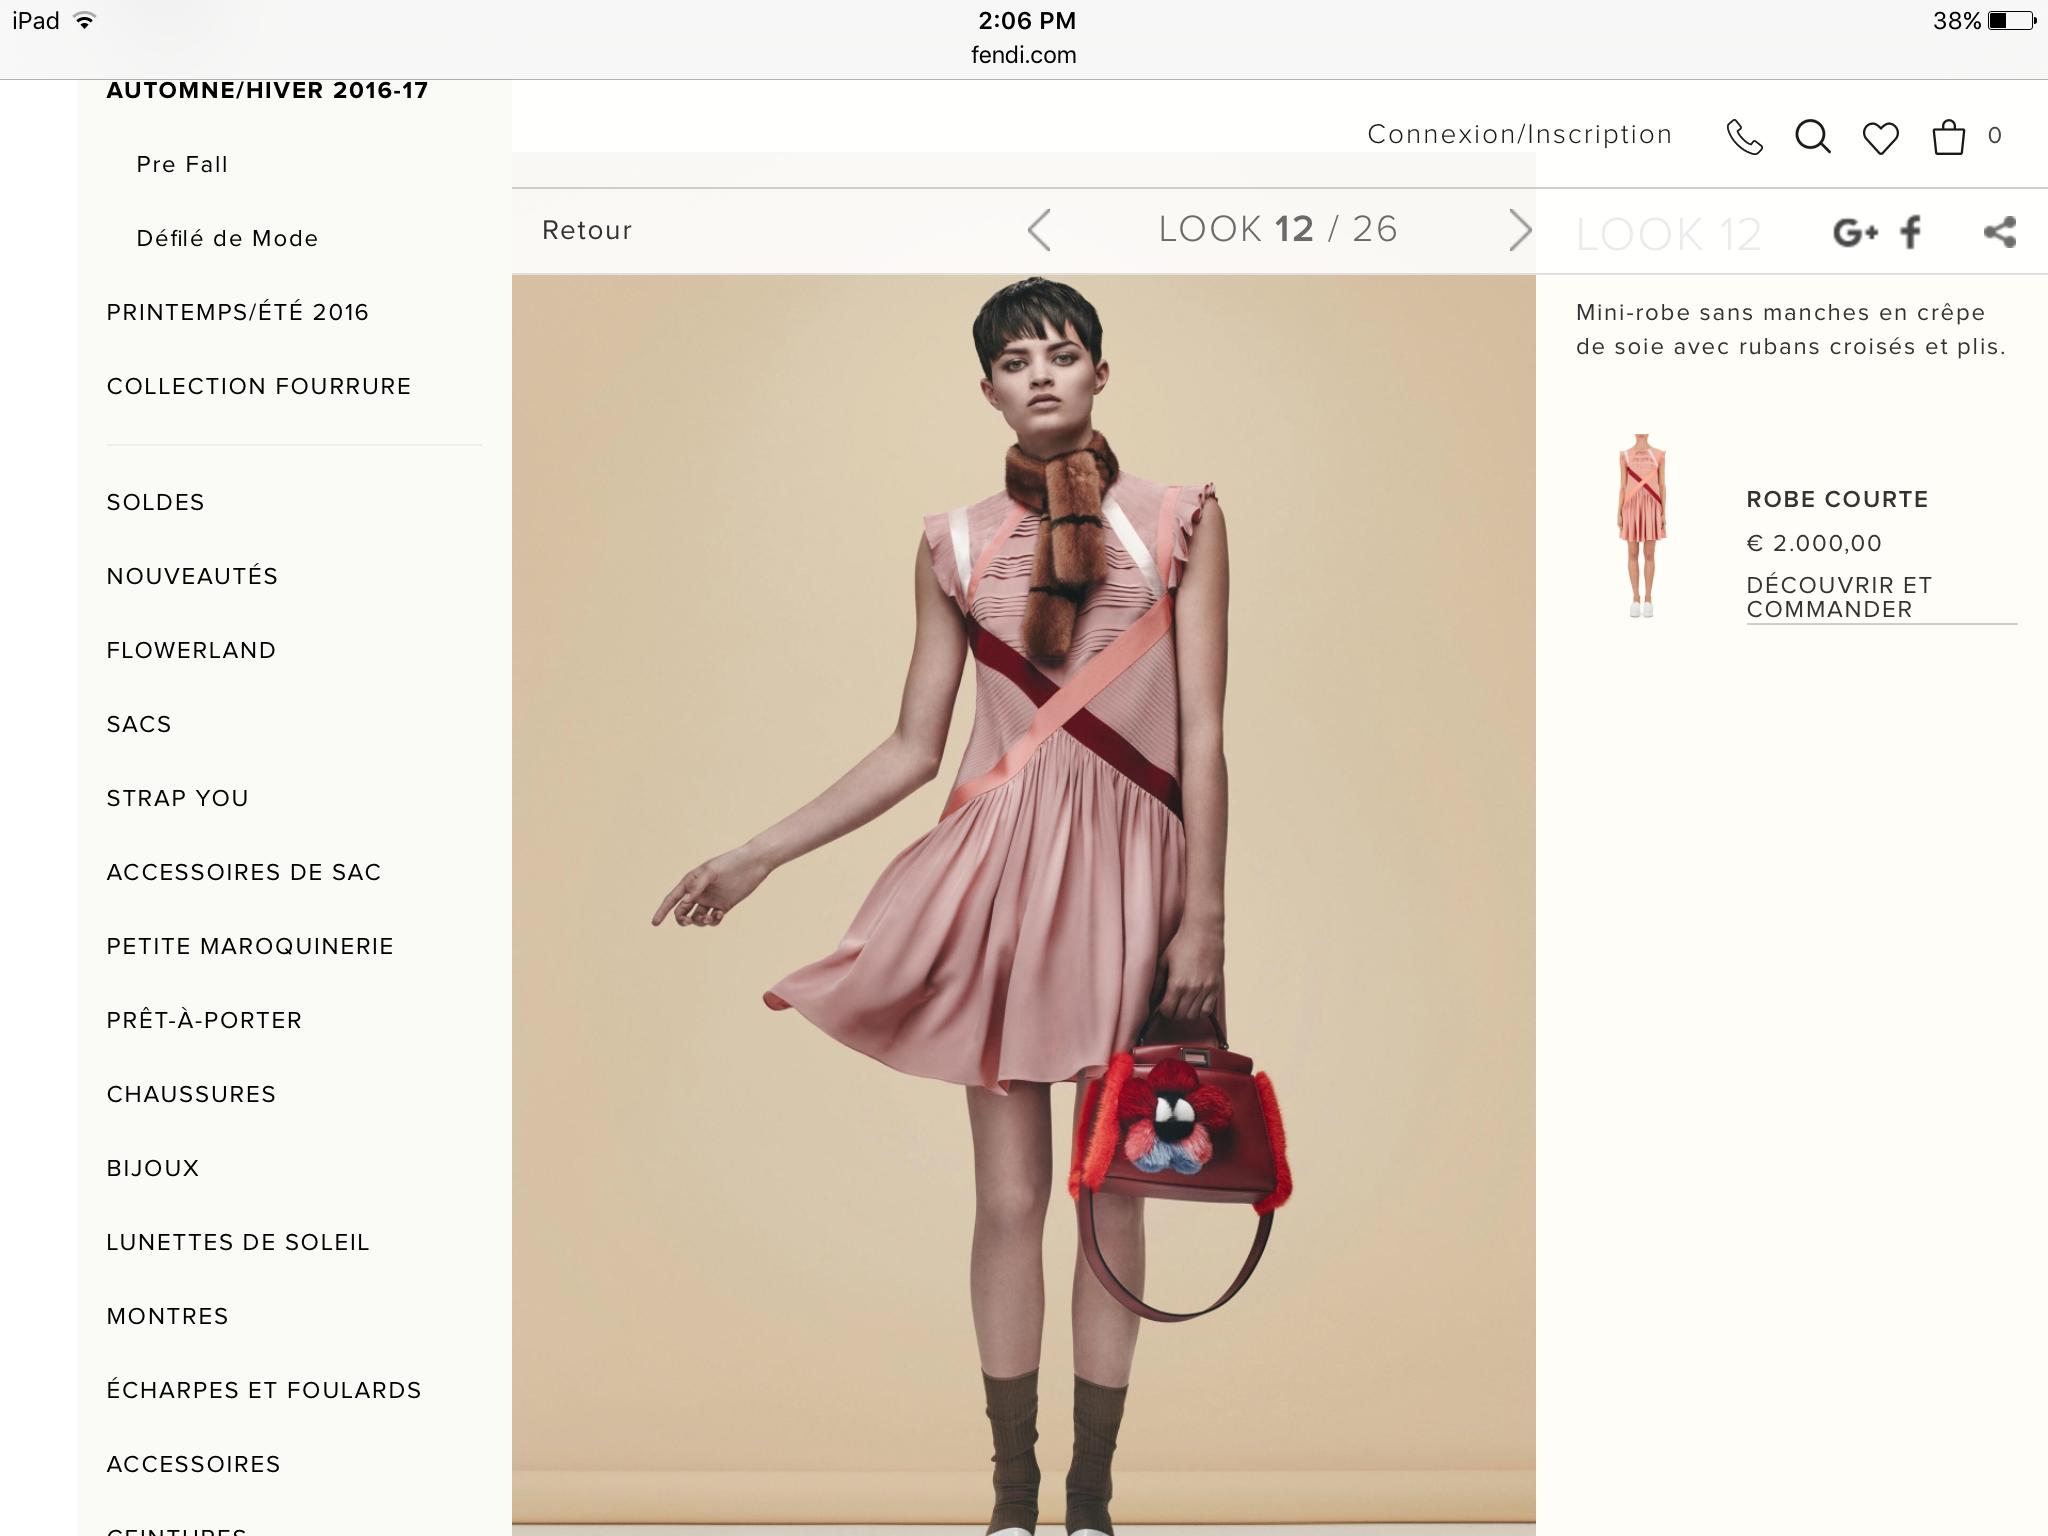 Pin by Solange Petrignani on Fashion | Pinterest | Fashion